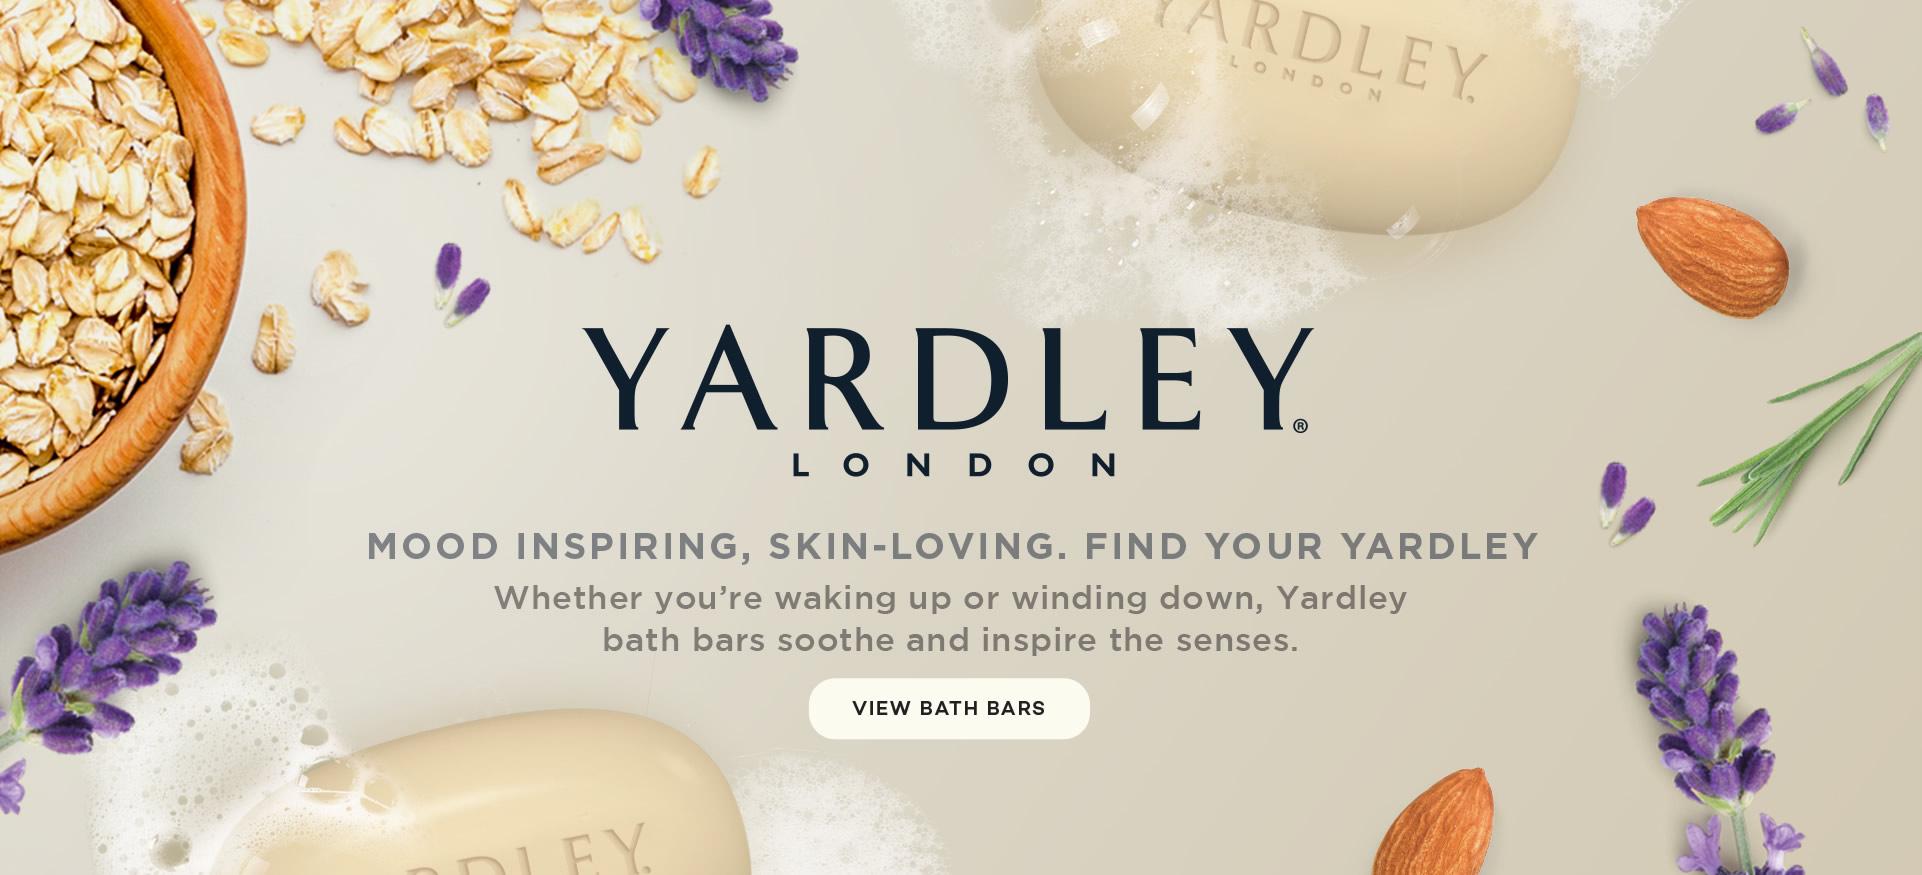 Yardley London Bath Bars